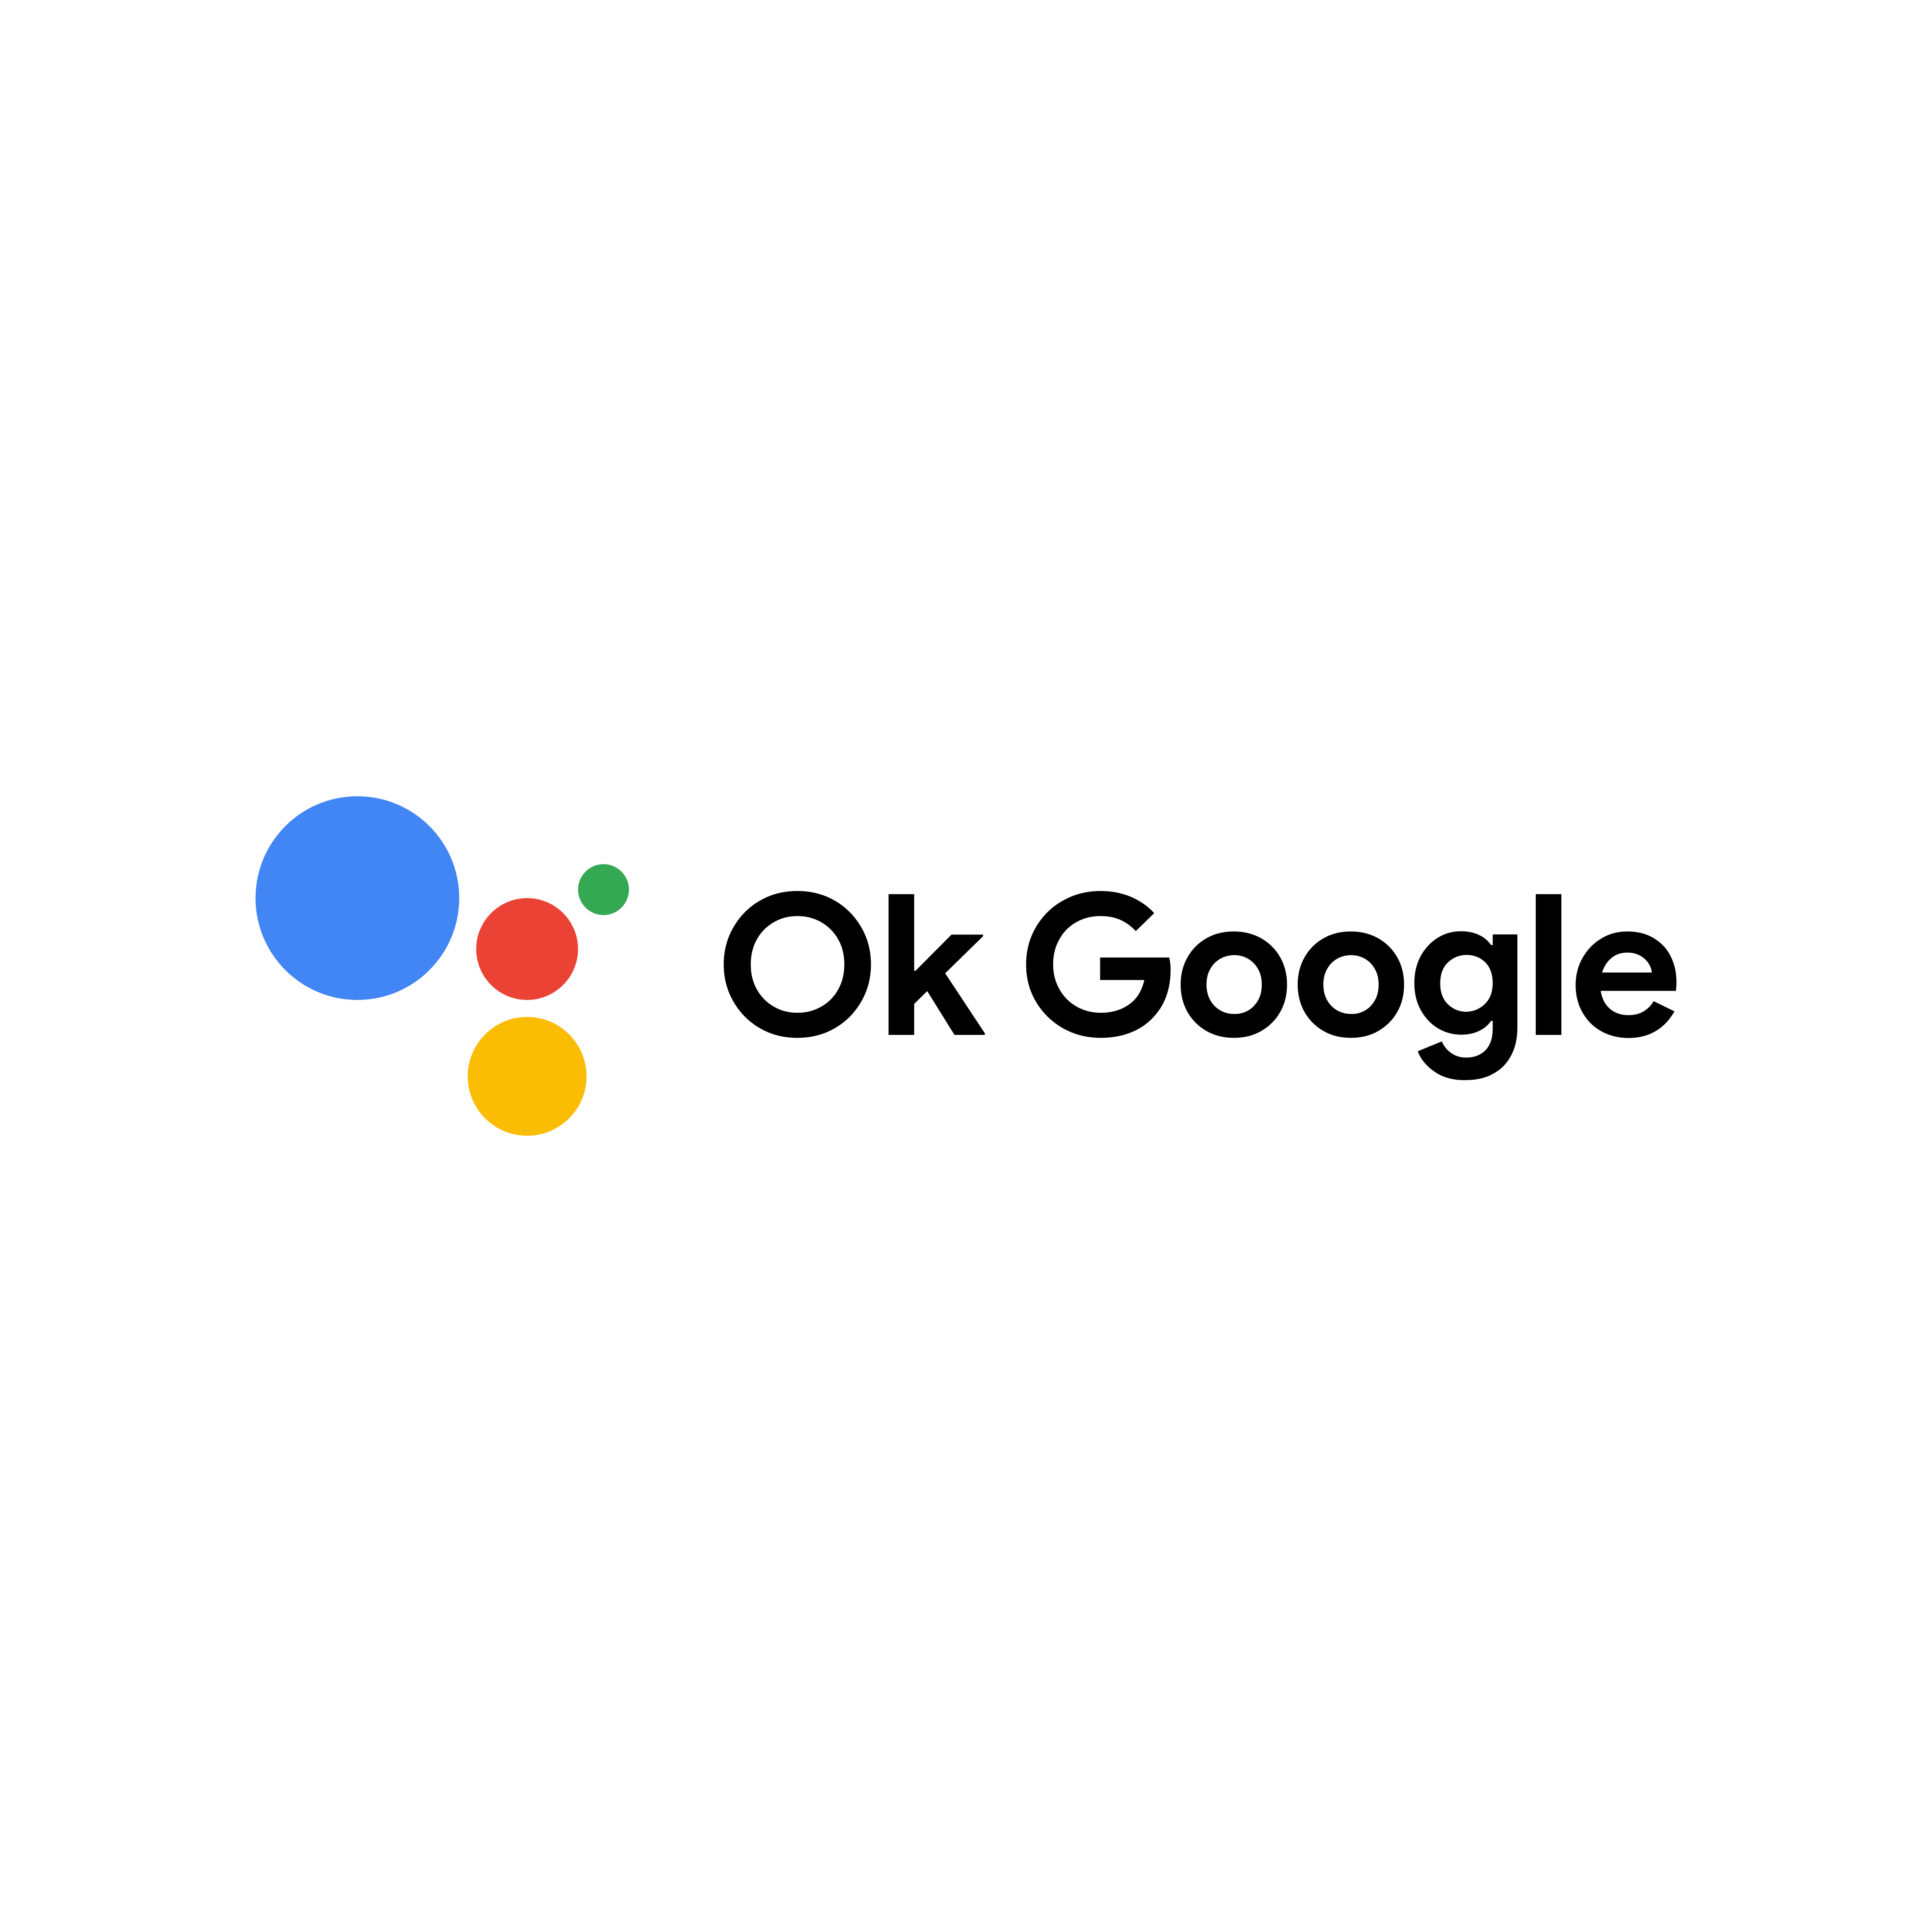 ok google logo 0 - Ok Google Logo